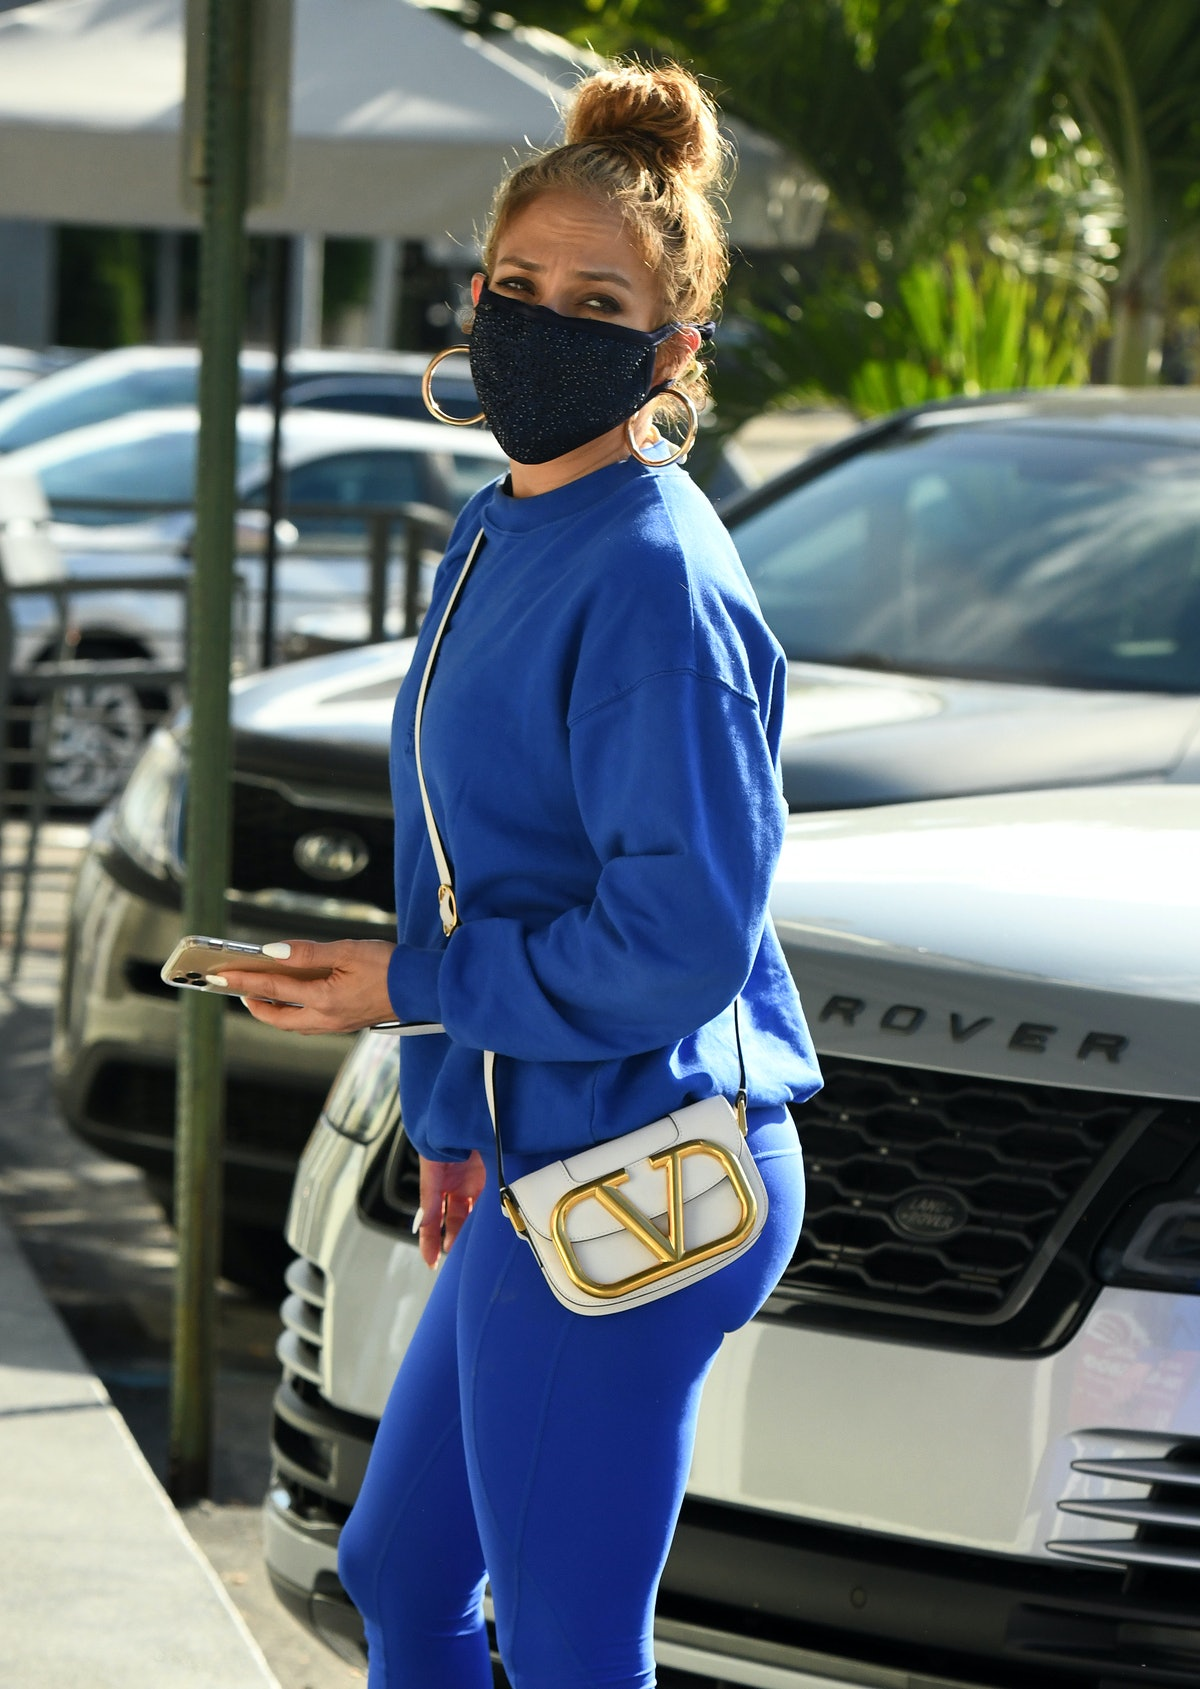 Jennifer Lopez is seen on December 23, 2020 in Miami, Florida.